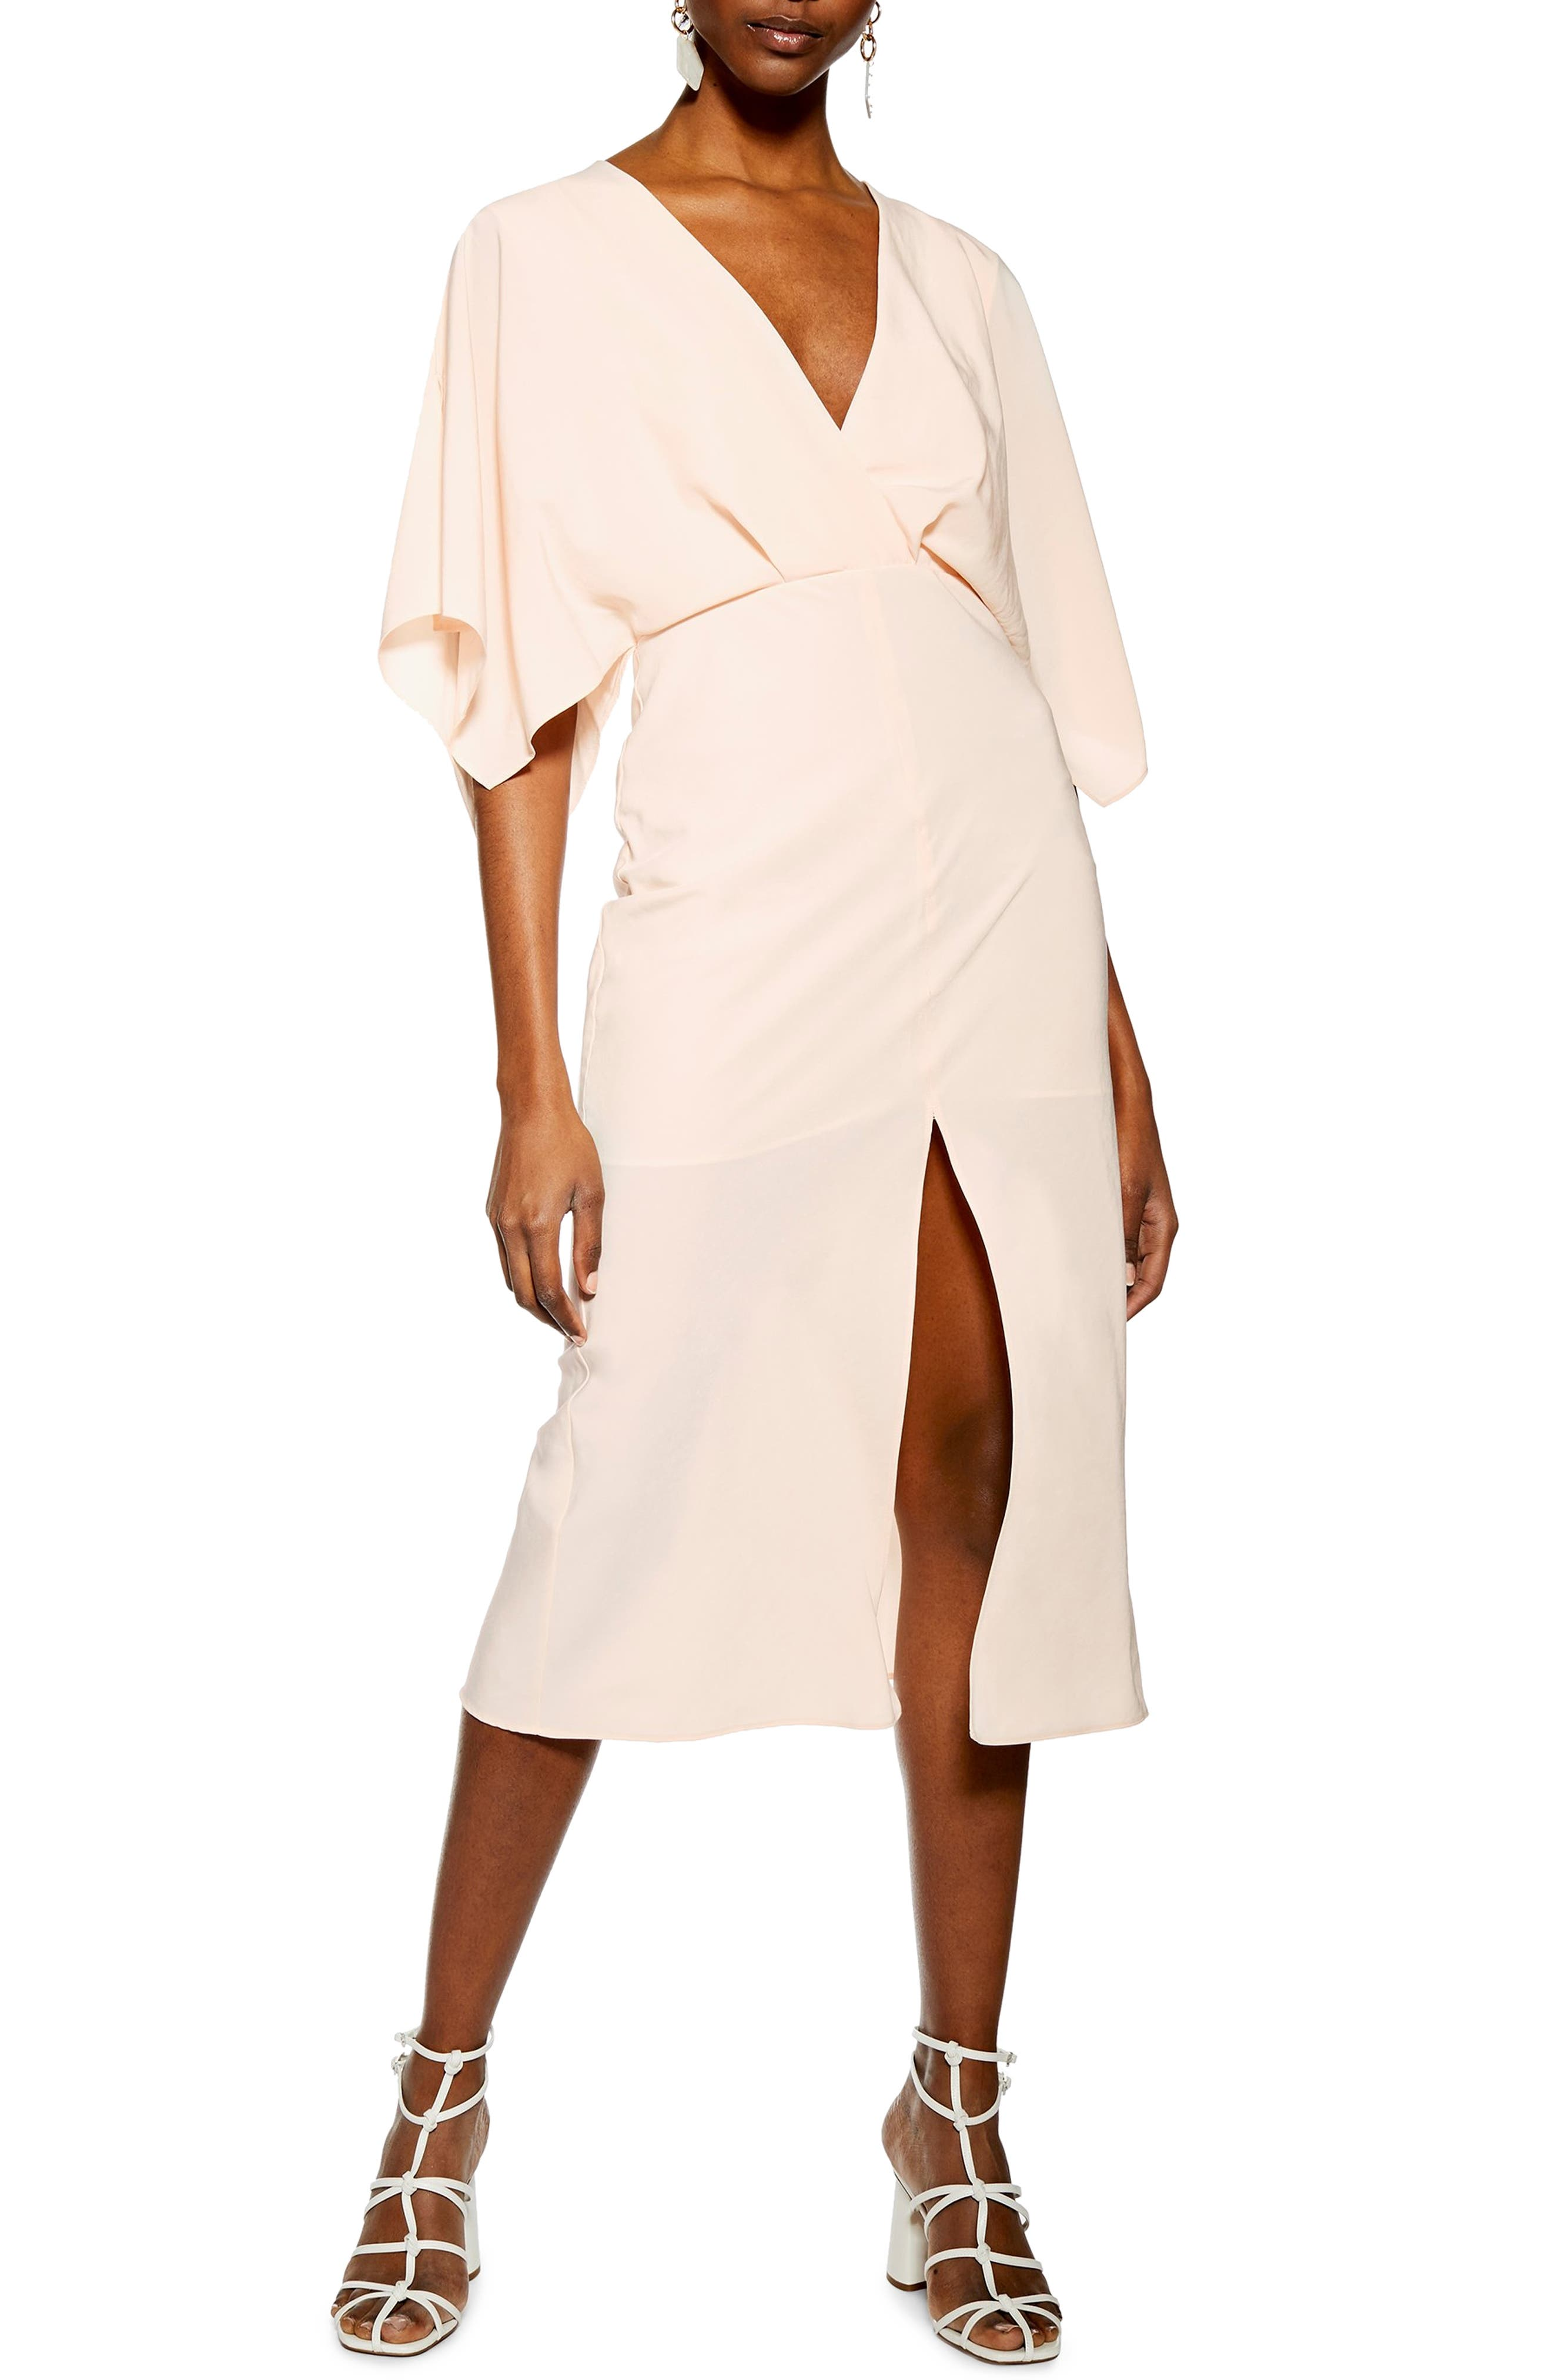 Topshop Batwing Plunge Tea Length Dress, US (fits like 10-12) - Pink